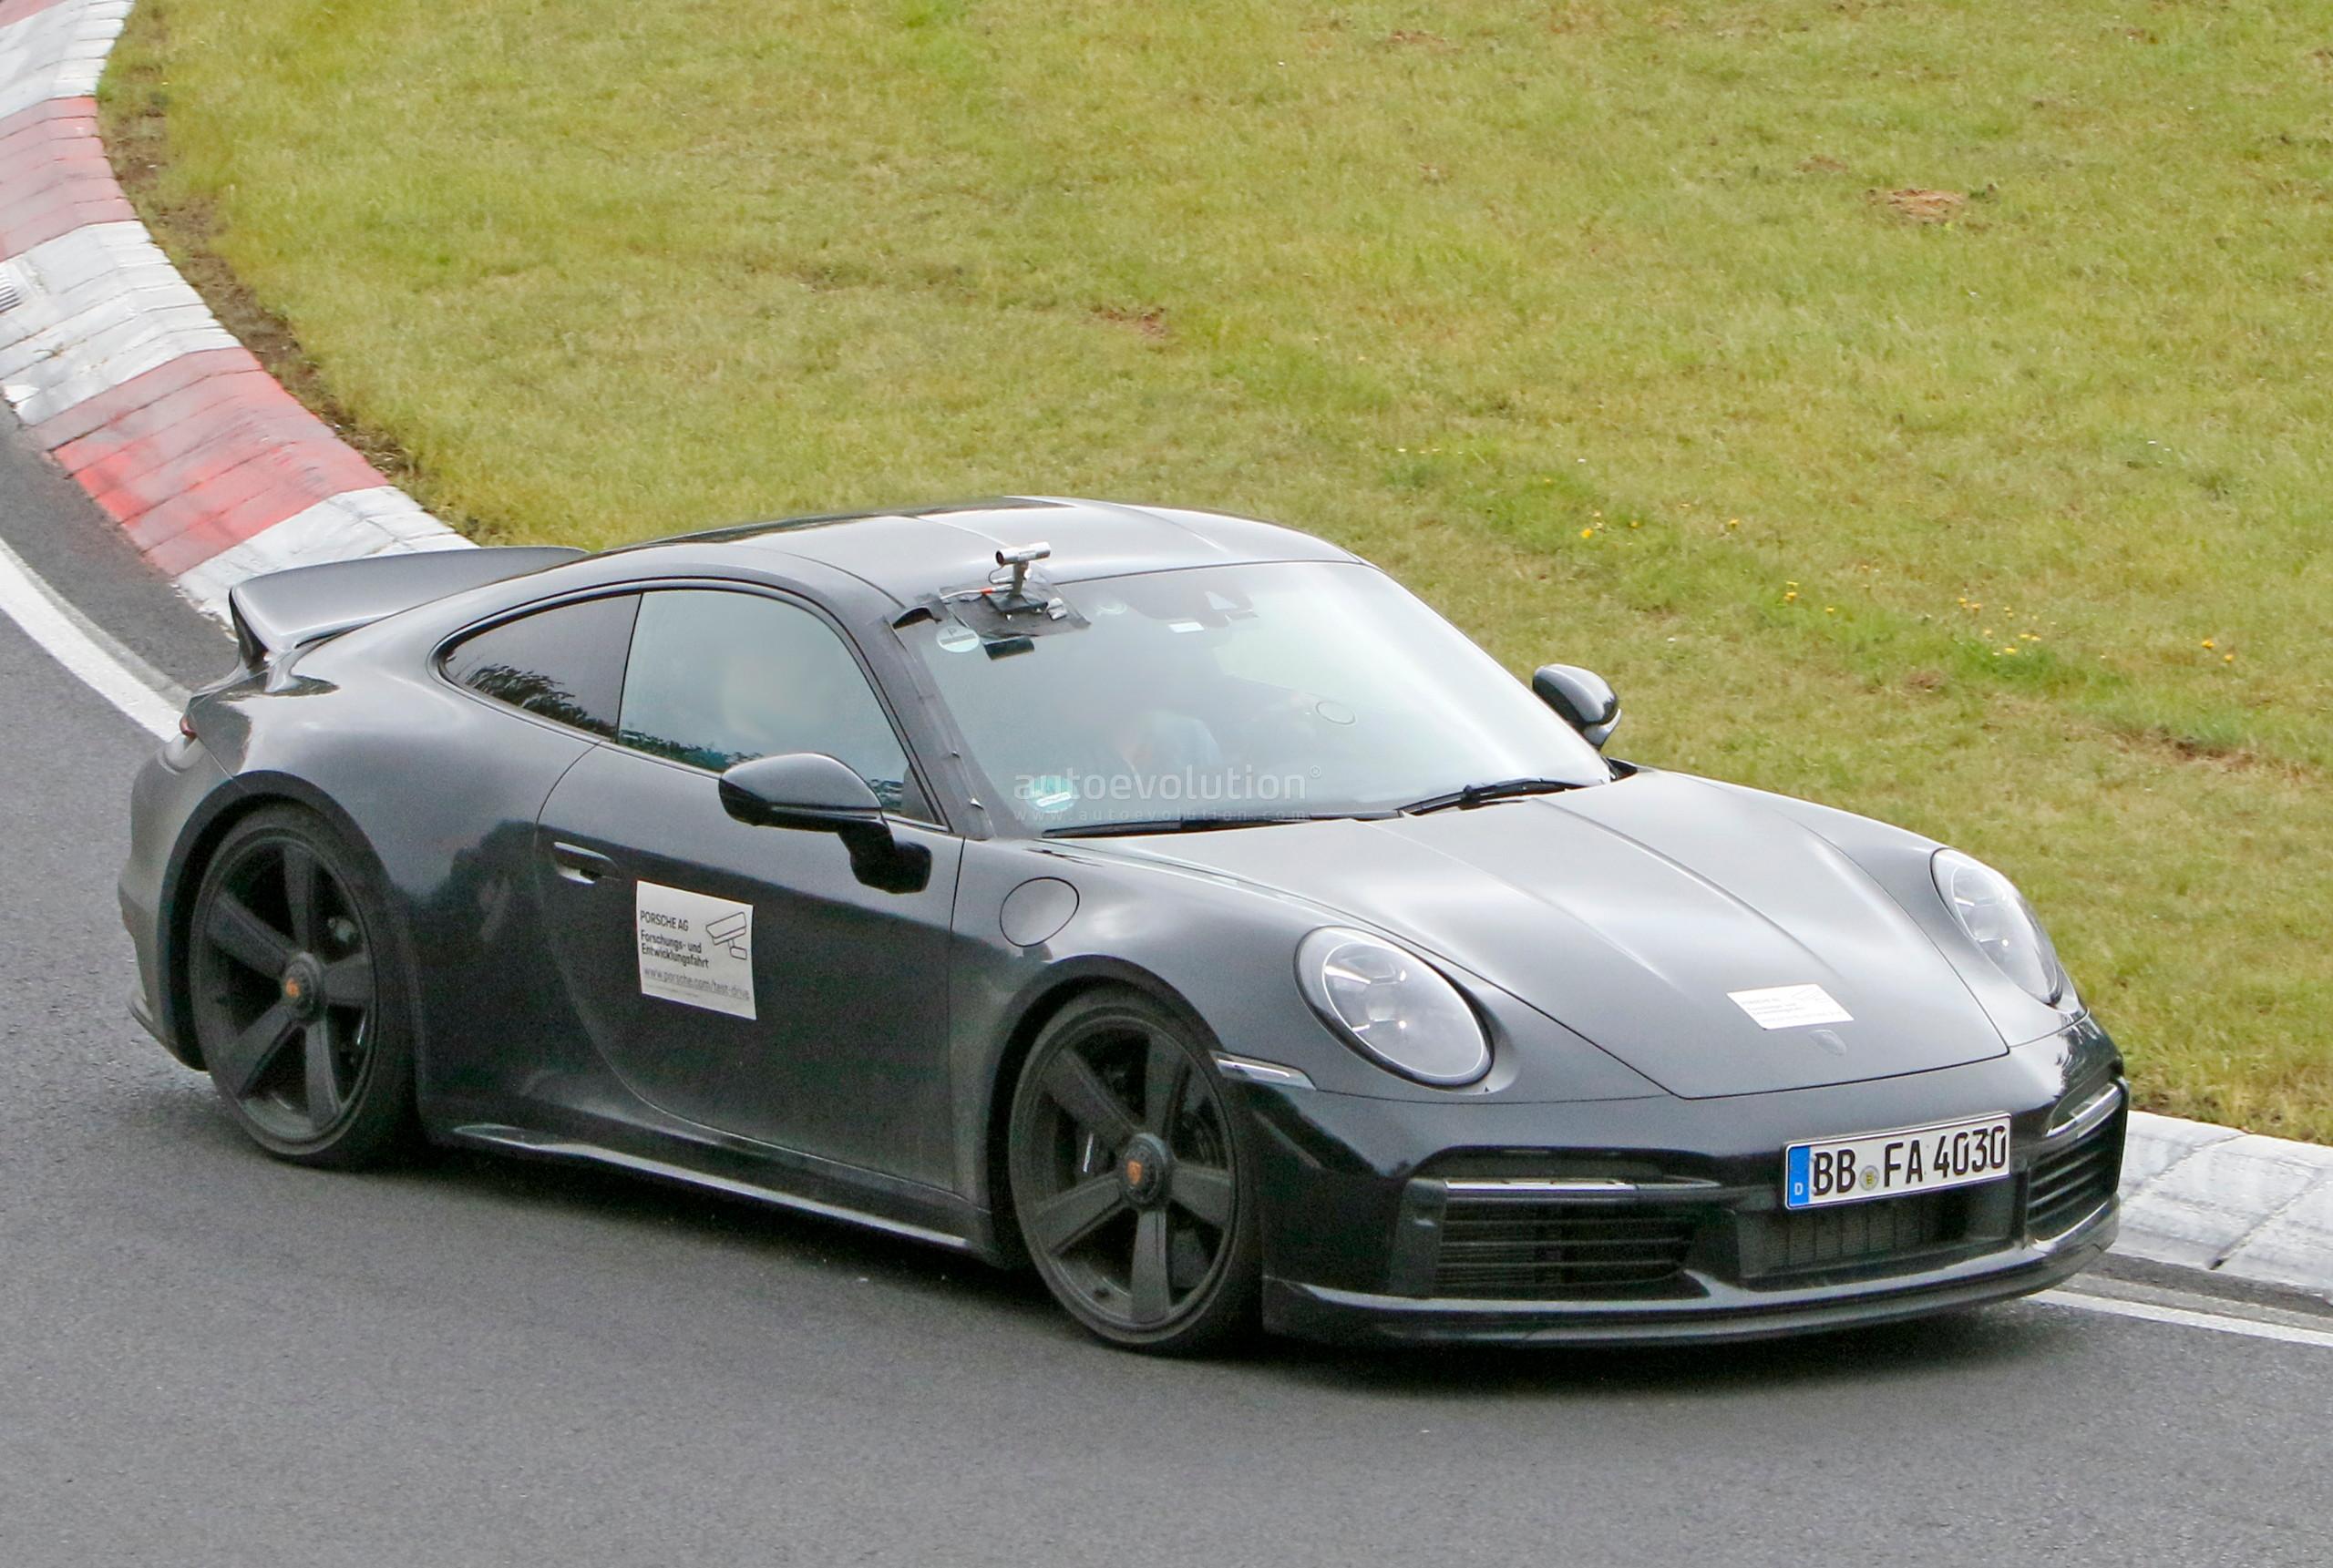 Porsche 911 (992) Sport Classic Prototype Comes Back For More Racetrack Action